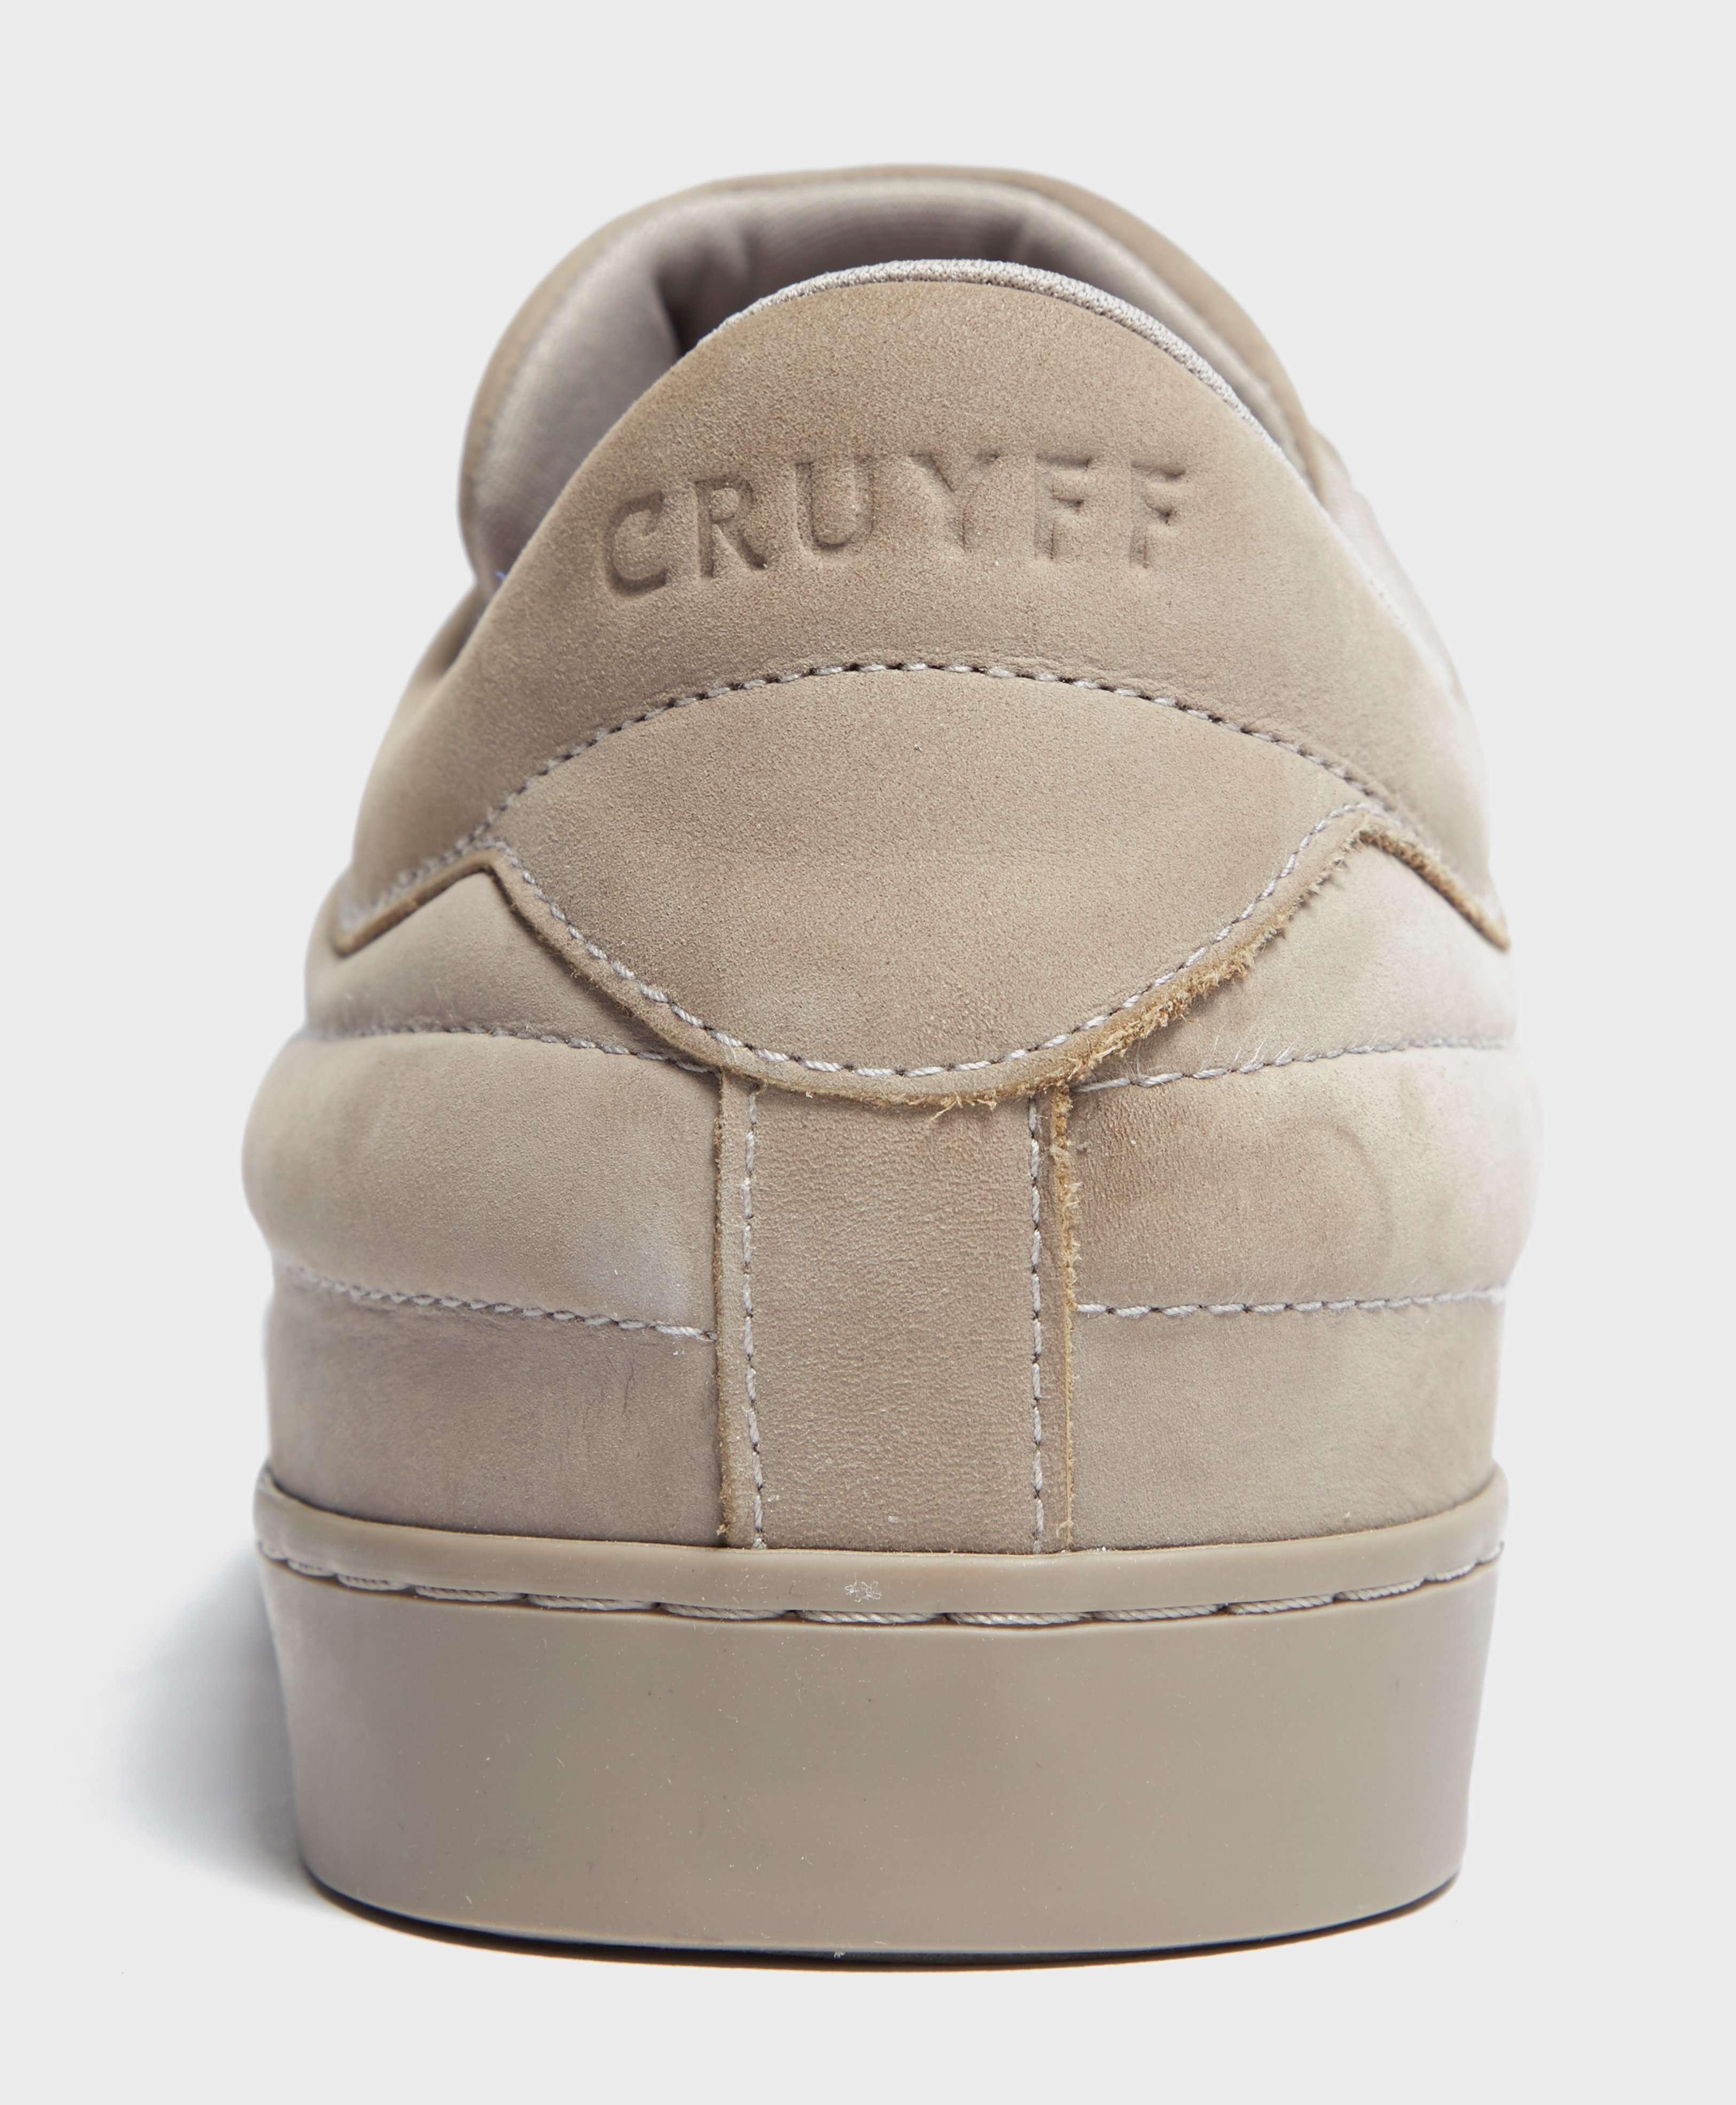 Cruyff Rebel Suede